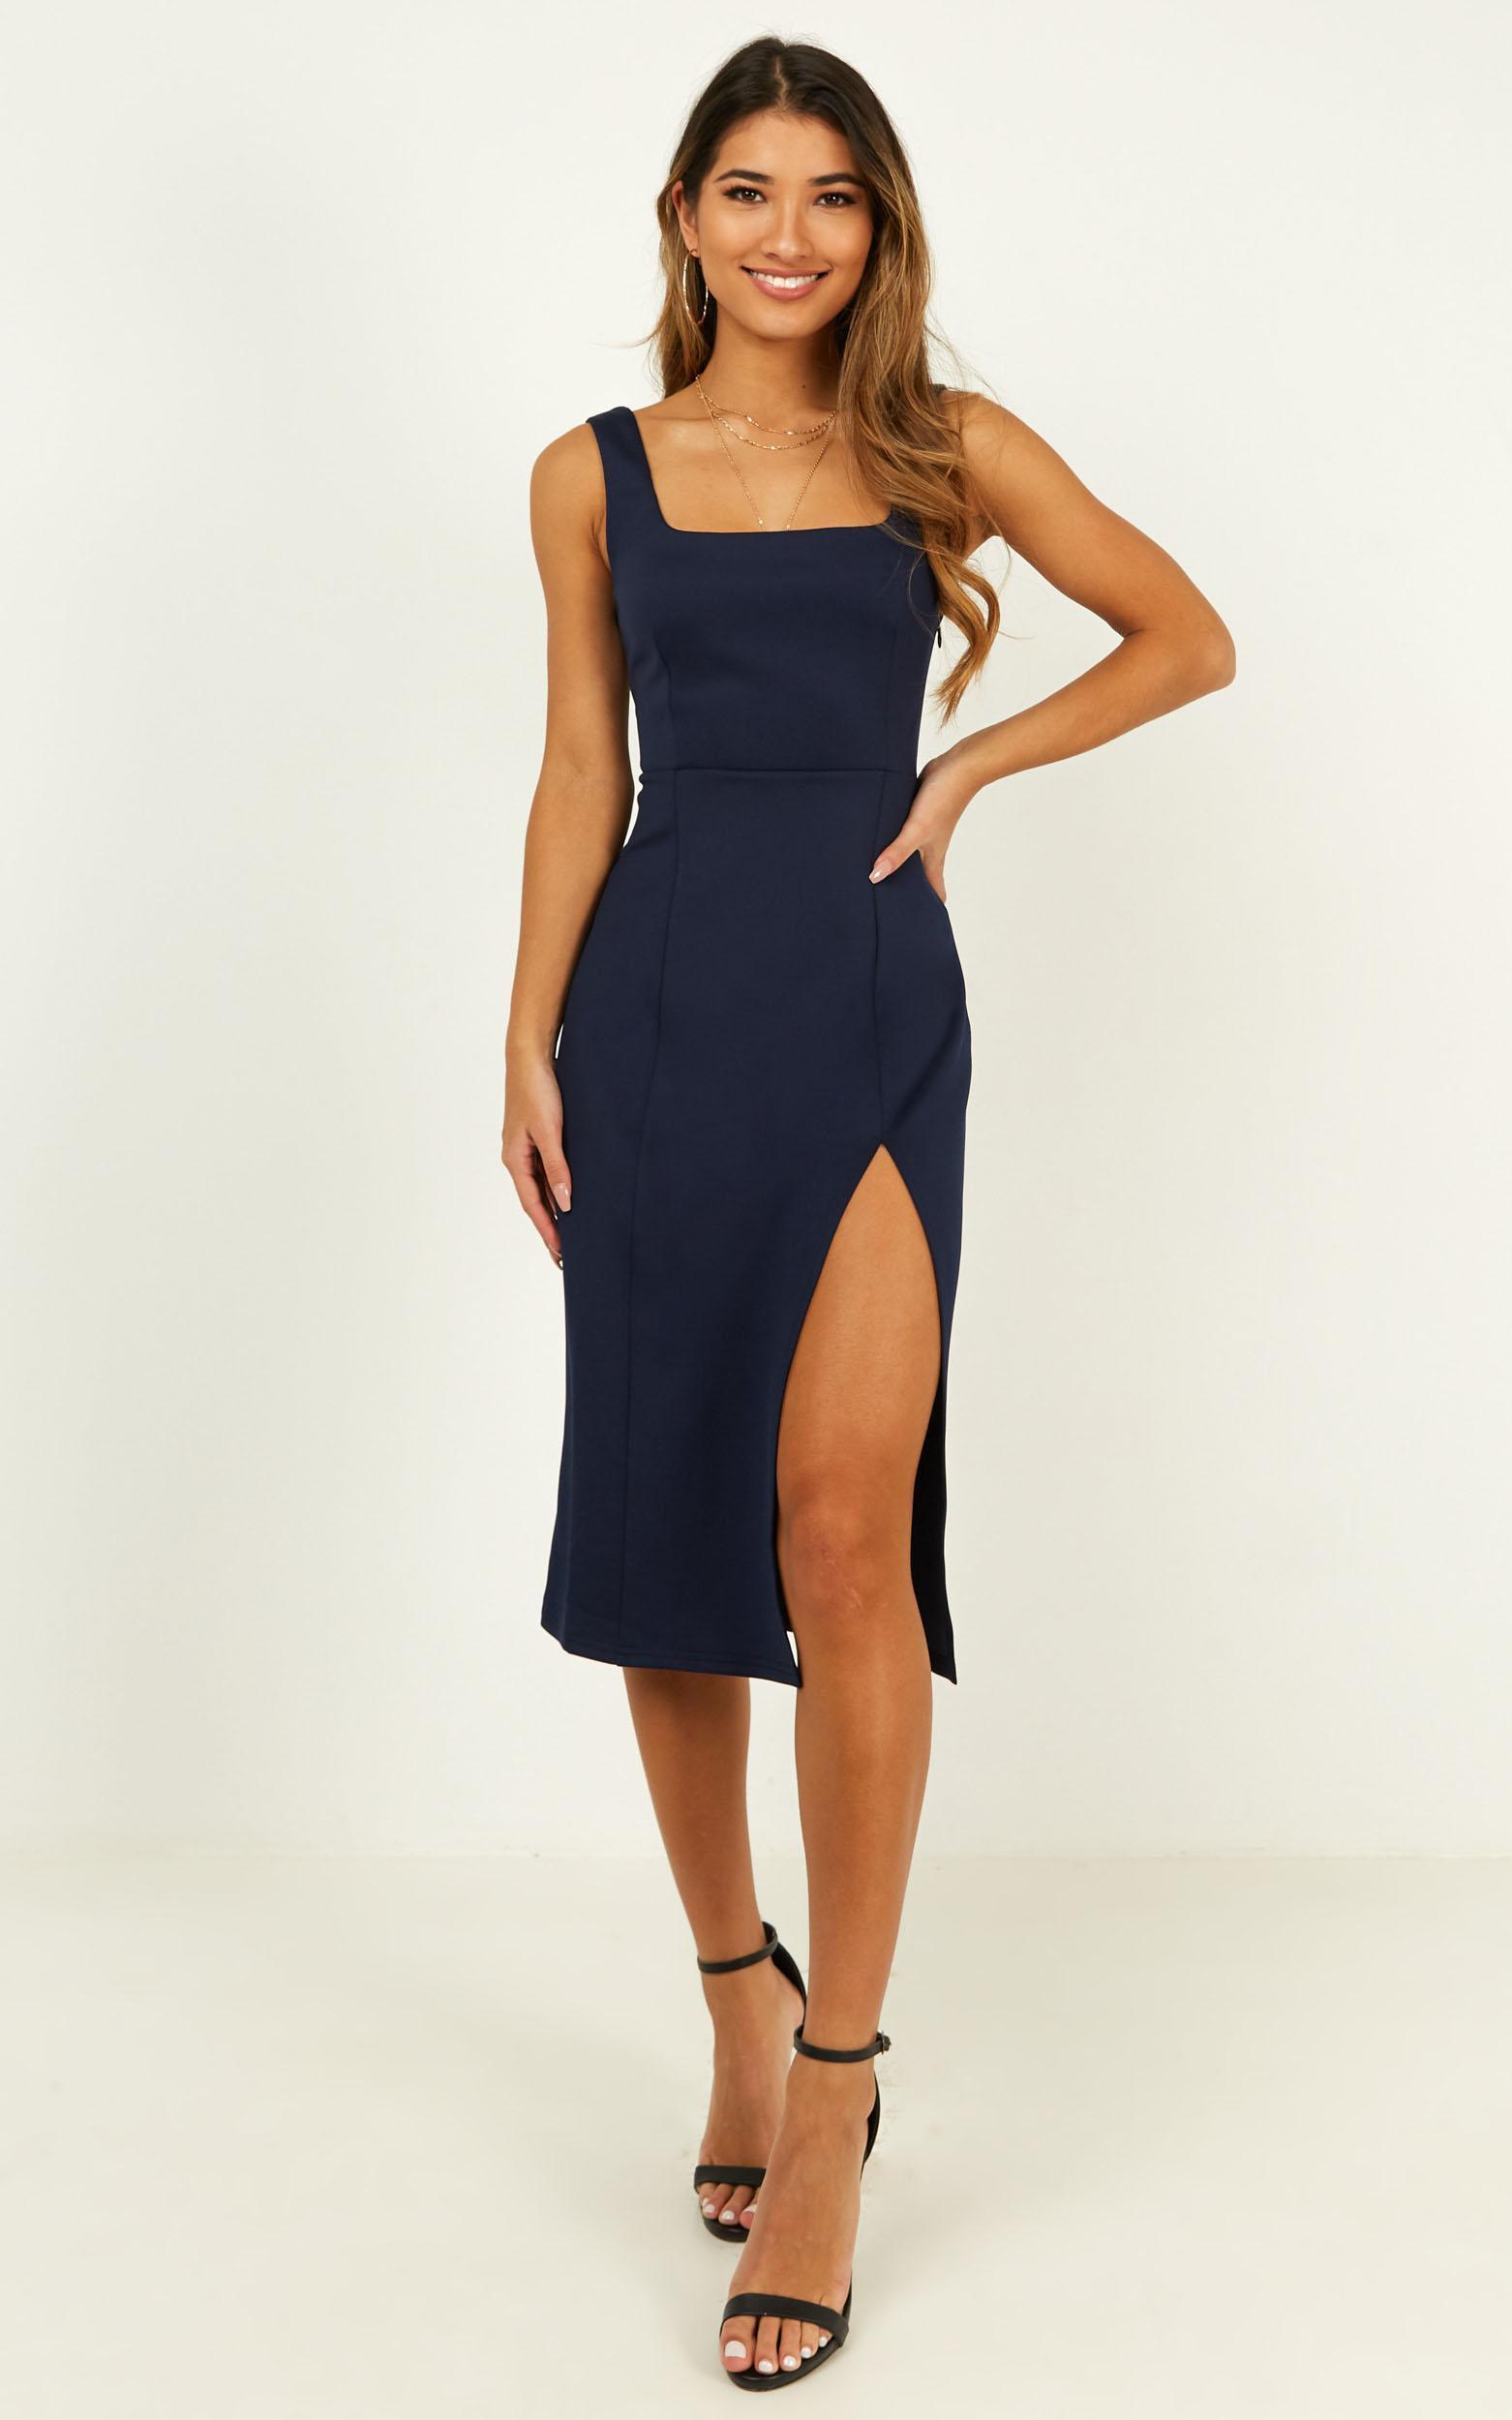 Mini Love Dress in navy - 20 (XXXXL), Navy, hi-res image number null